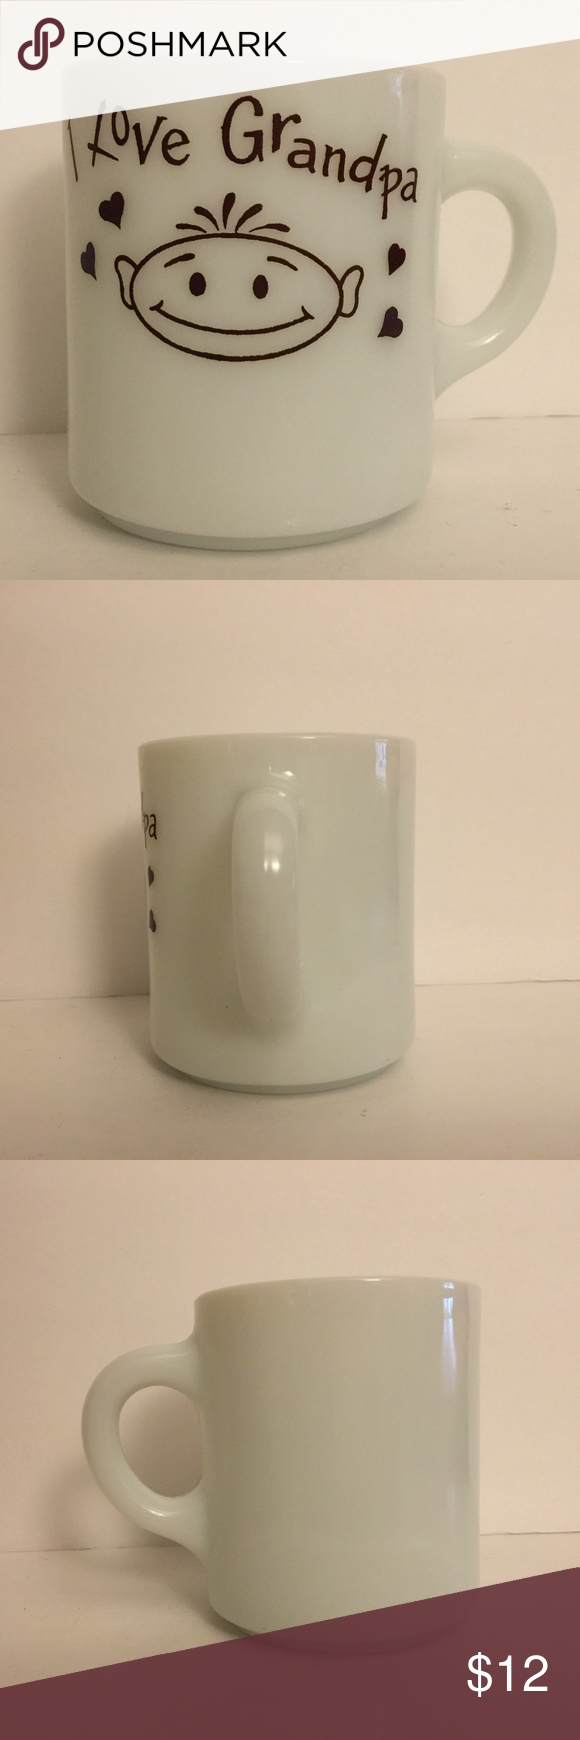 Vintage White Milk Glass I Love Grandpa Mug Vintage White Milk Glass I Love Grandpa Mug Brown Hearts & Lettering #74 Stamped on Bottom 3.5